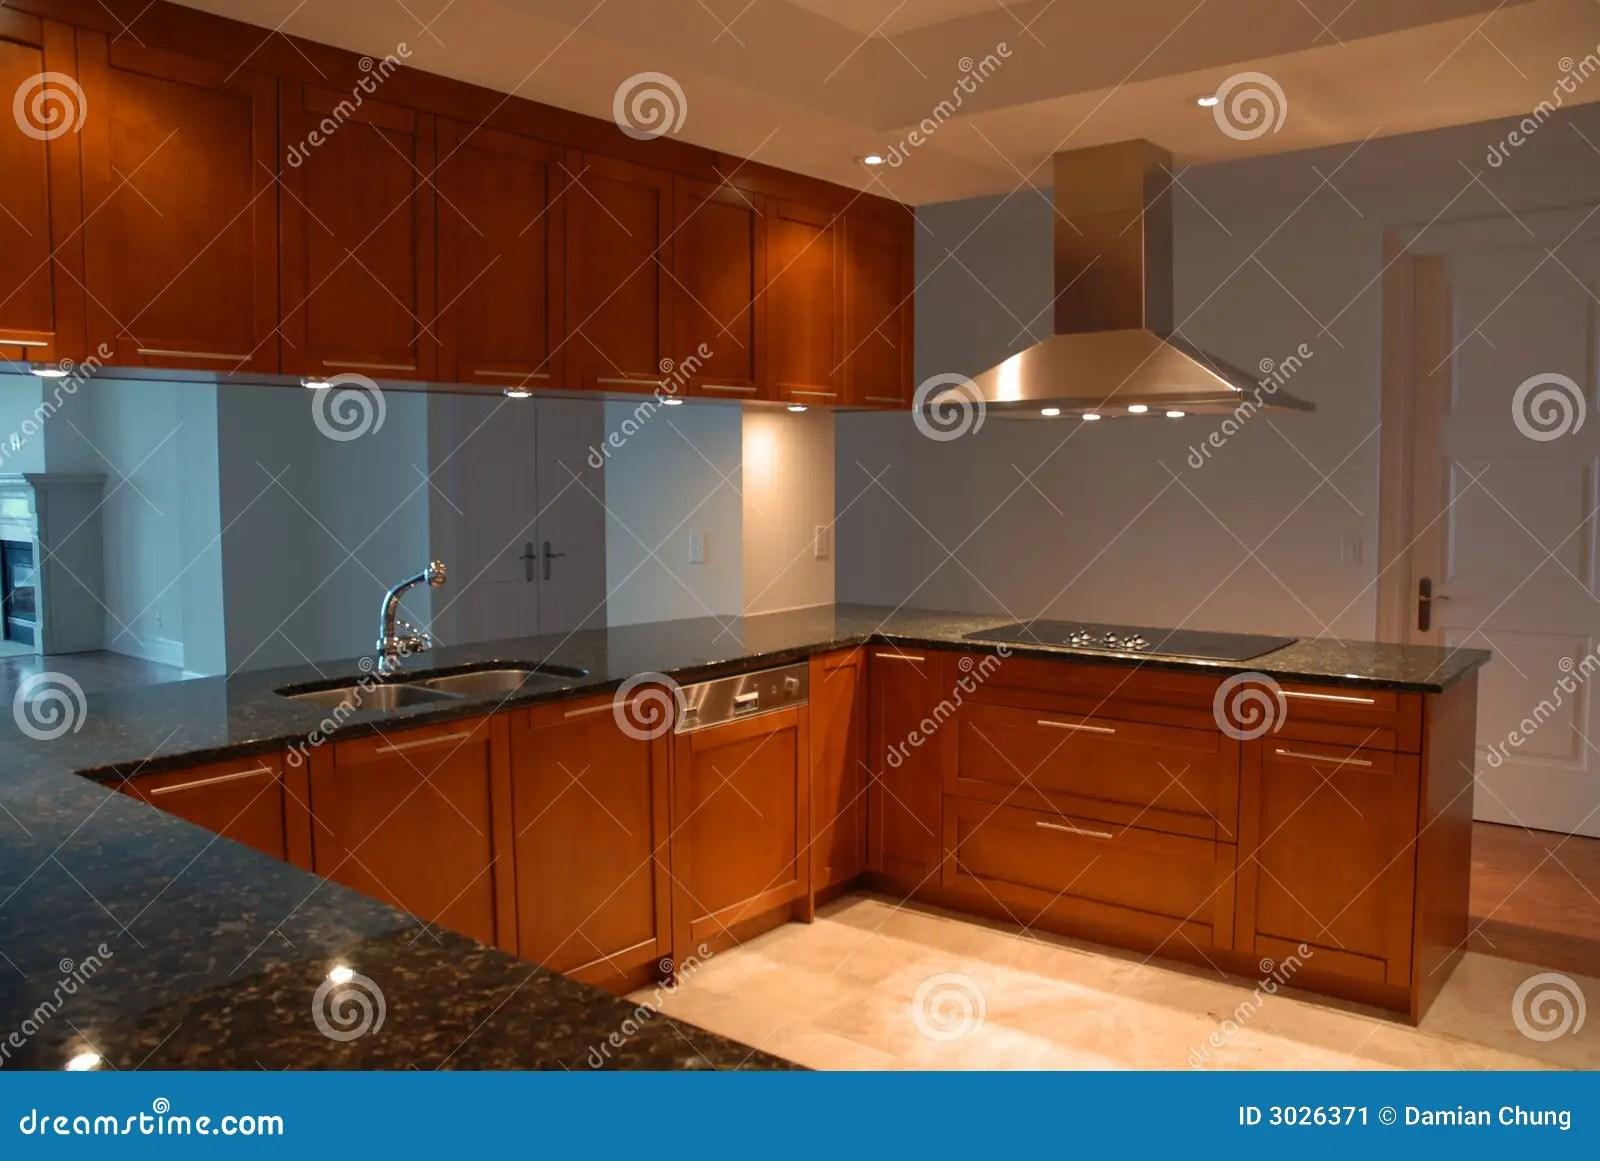 Fancy Kitchen stock image Image of mahogany kitchen